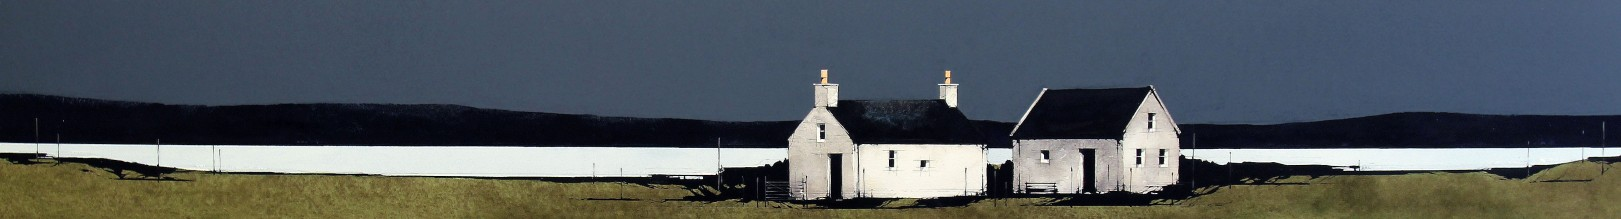 Ron Lawson_Cottages, Gigha I_EAS585_Watercolour & Gouache_5.5x38.5